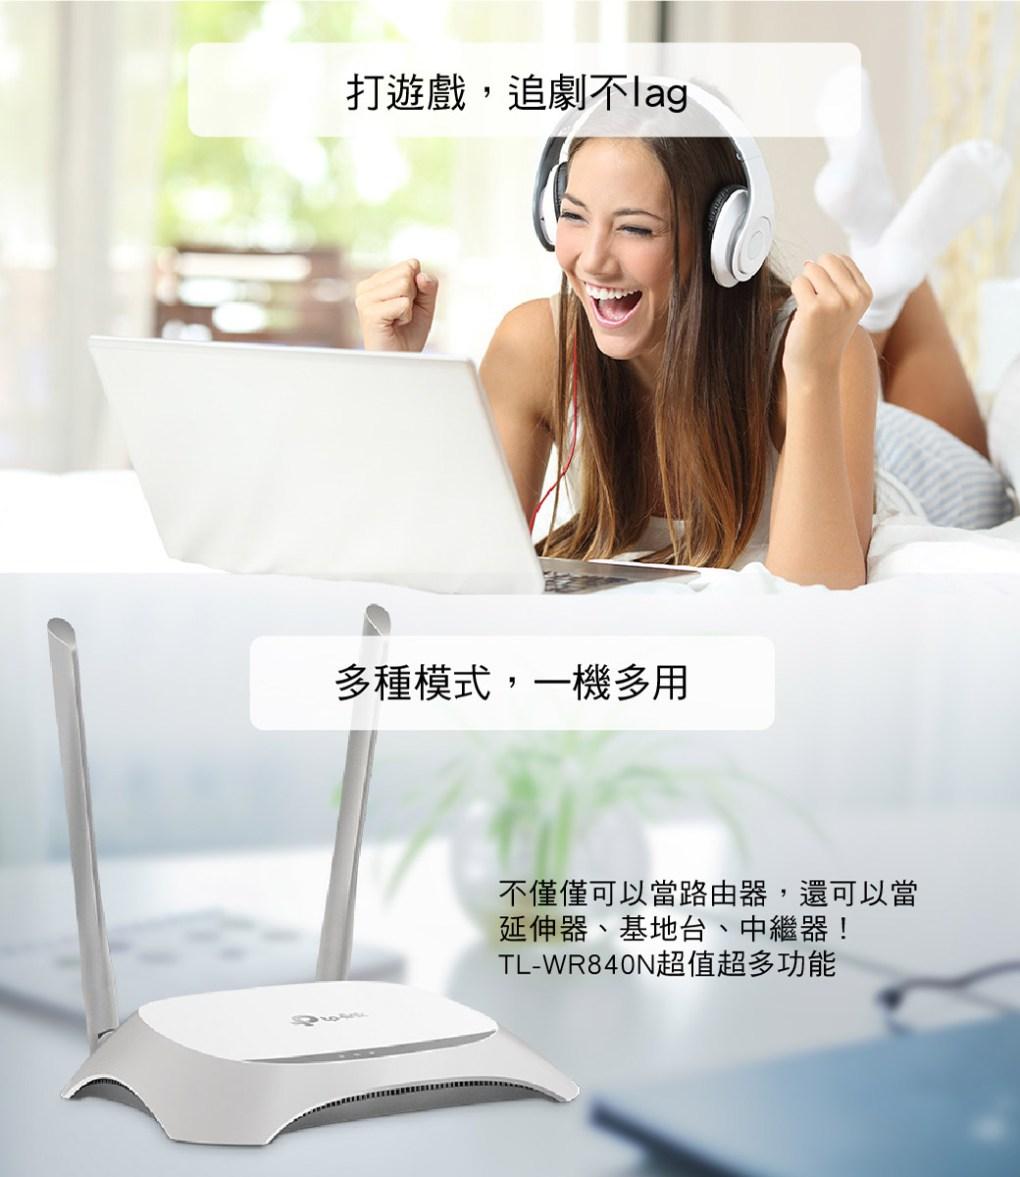 TP-Link TL-WR840N 300Mbps 無線網路 WiFi 路由器(分享器) - TP Link TL WR840N 8